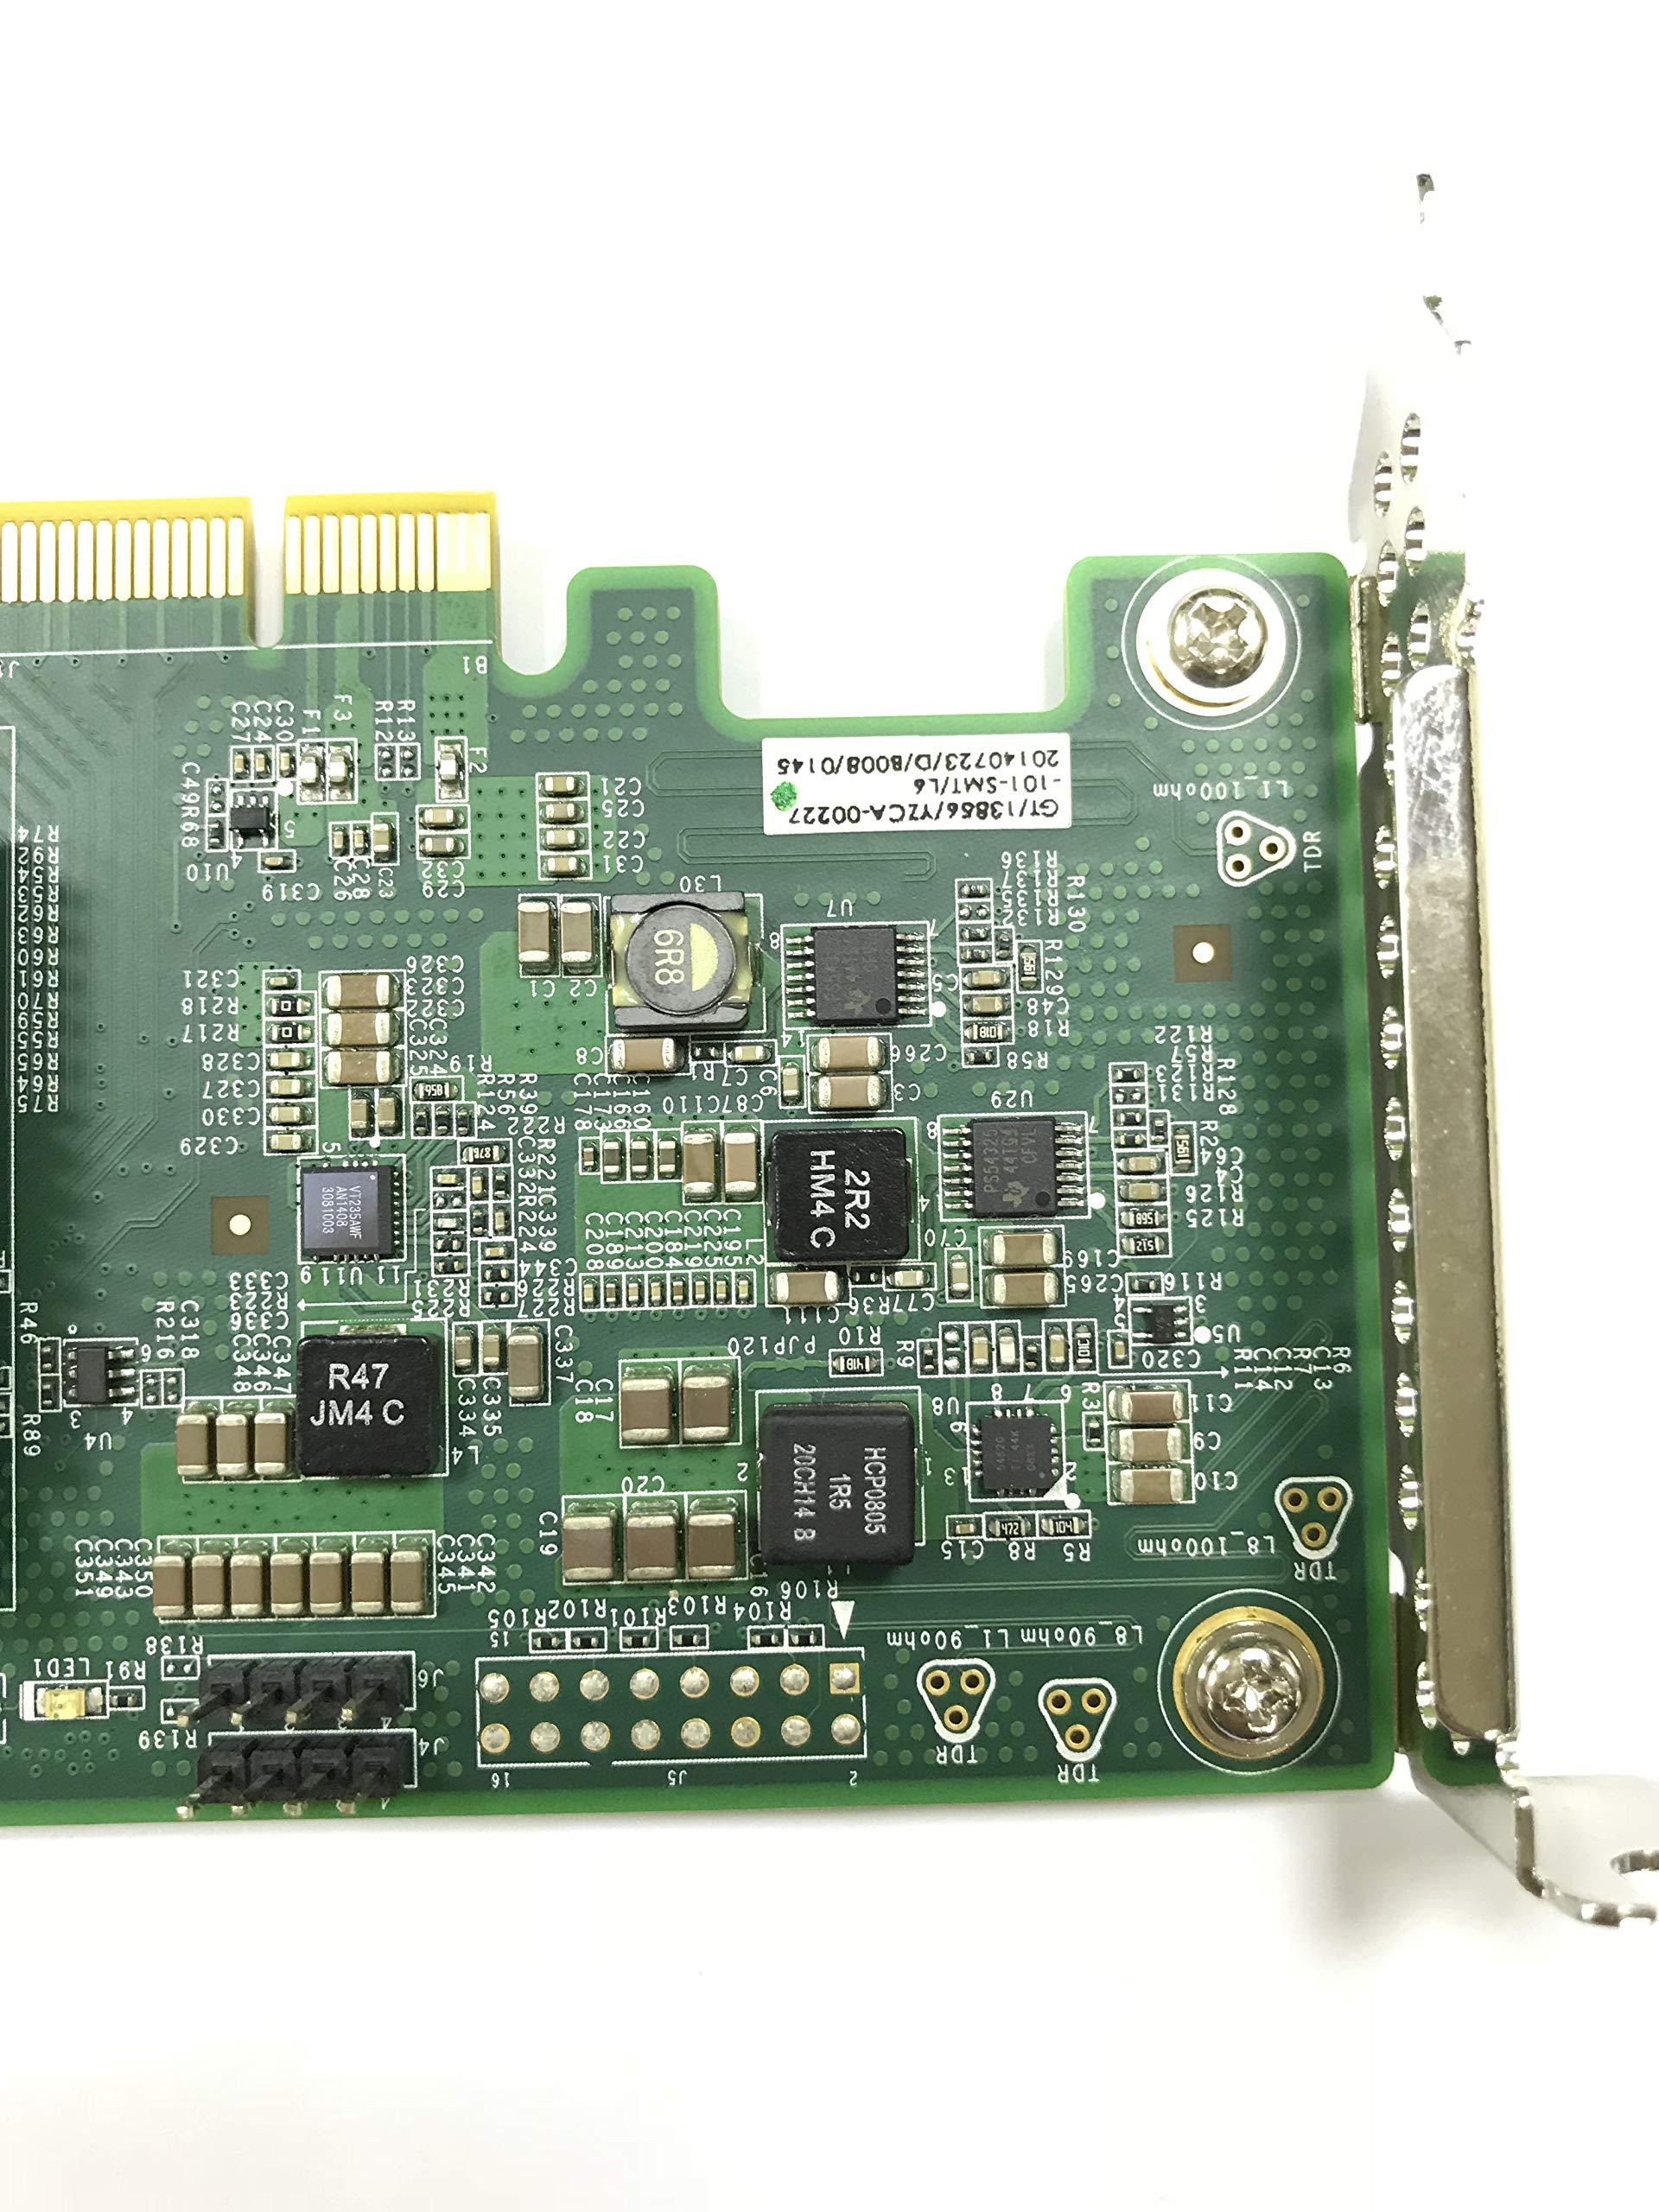 MFU SAS 9207-8i 8-Port 6Gb/s SAS+SATA to PCI Express 2.0 Host Bus Adapter by MFU (Image #5)